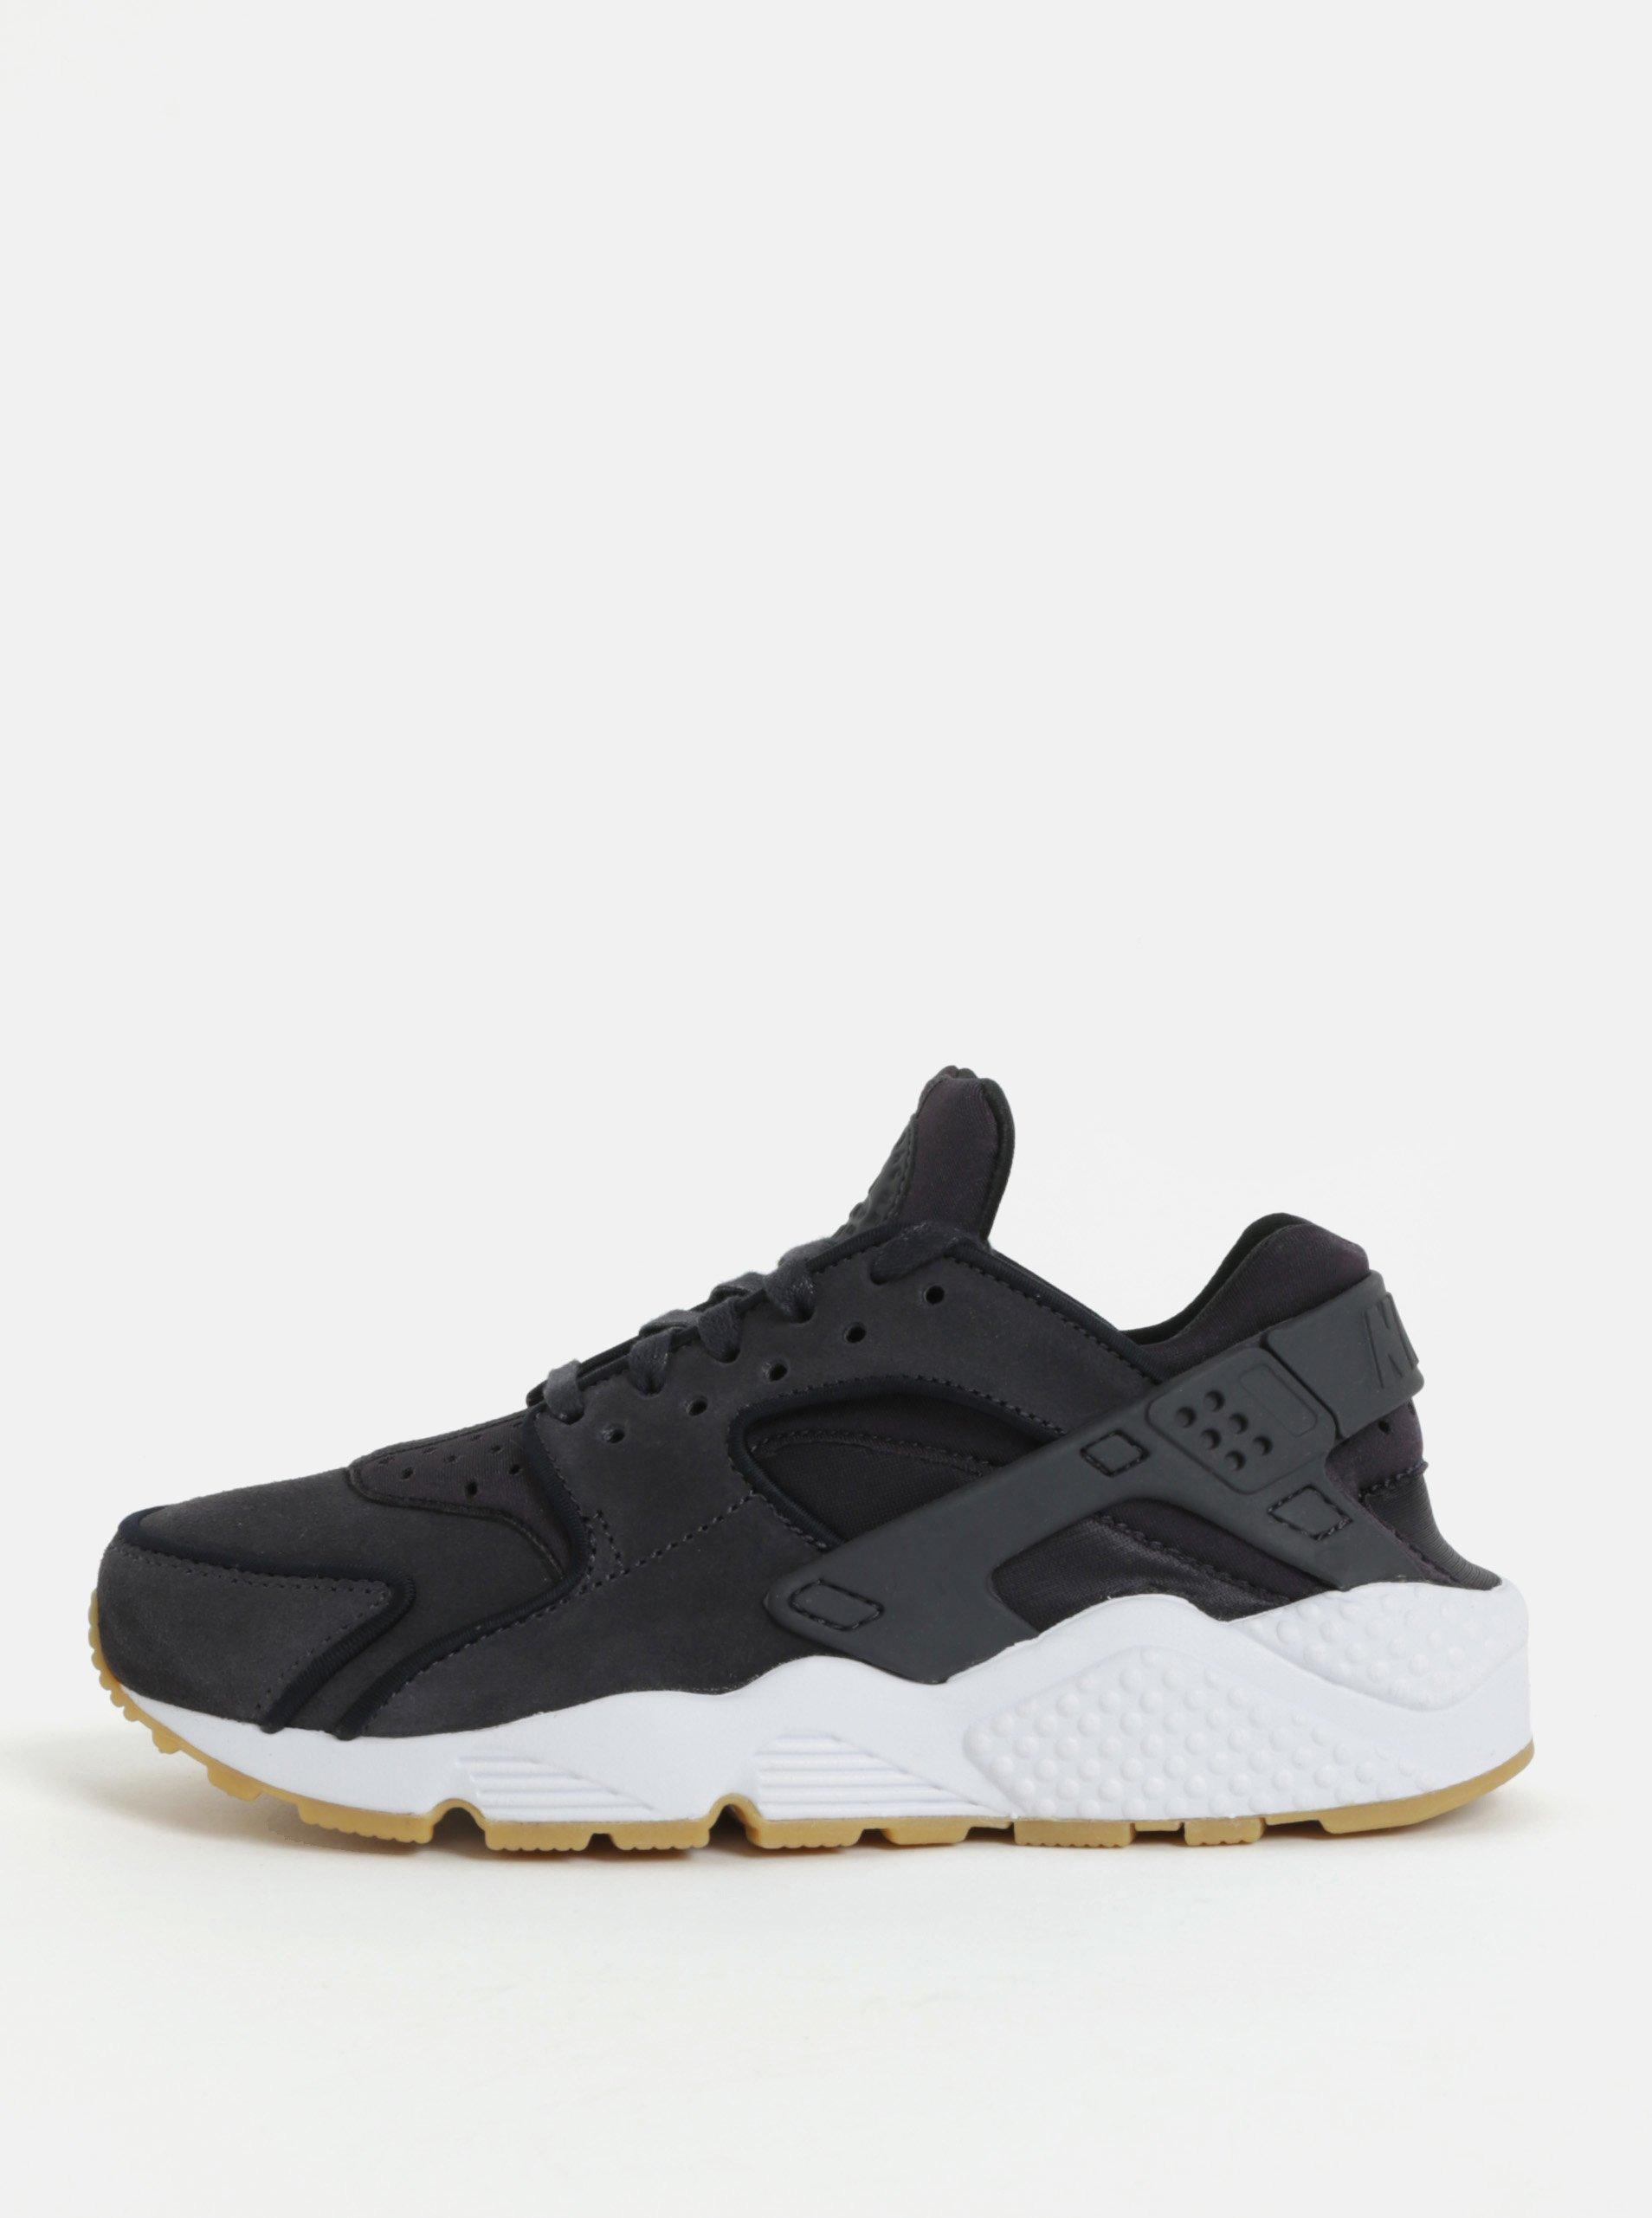 Čierne dámske tenisky Nike Air Huarache Run PRM eccf3ef13c9